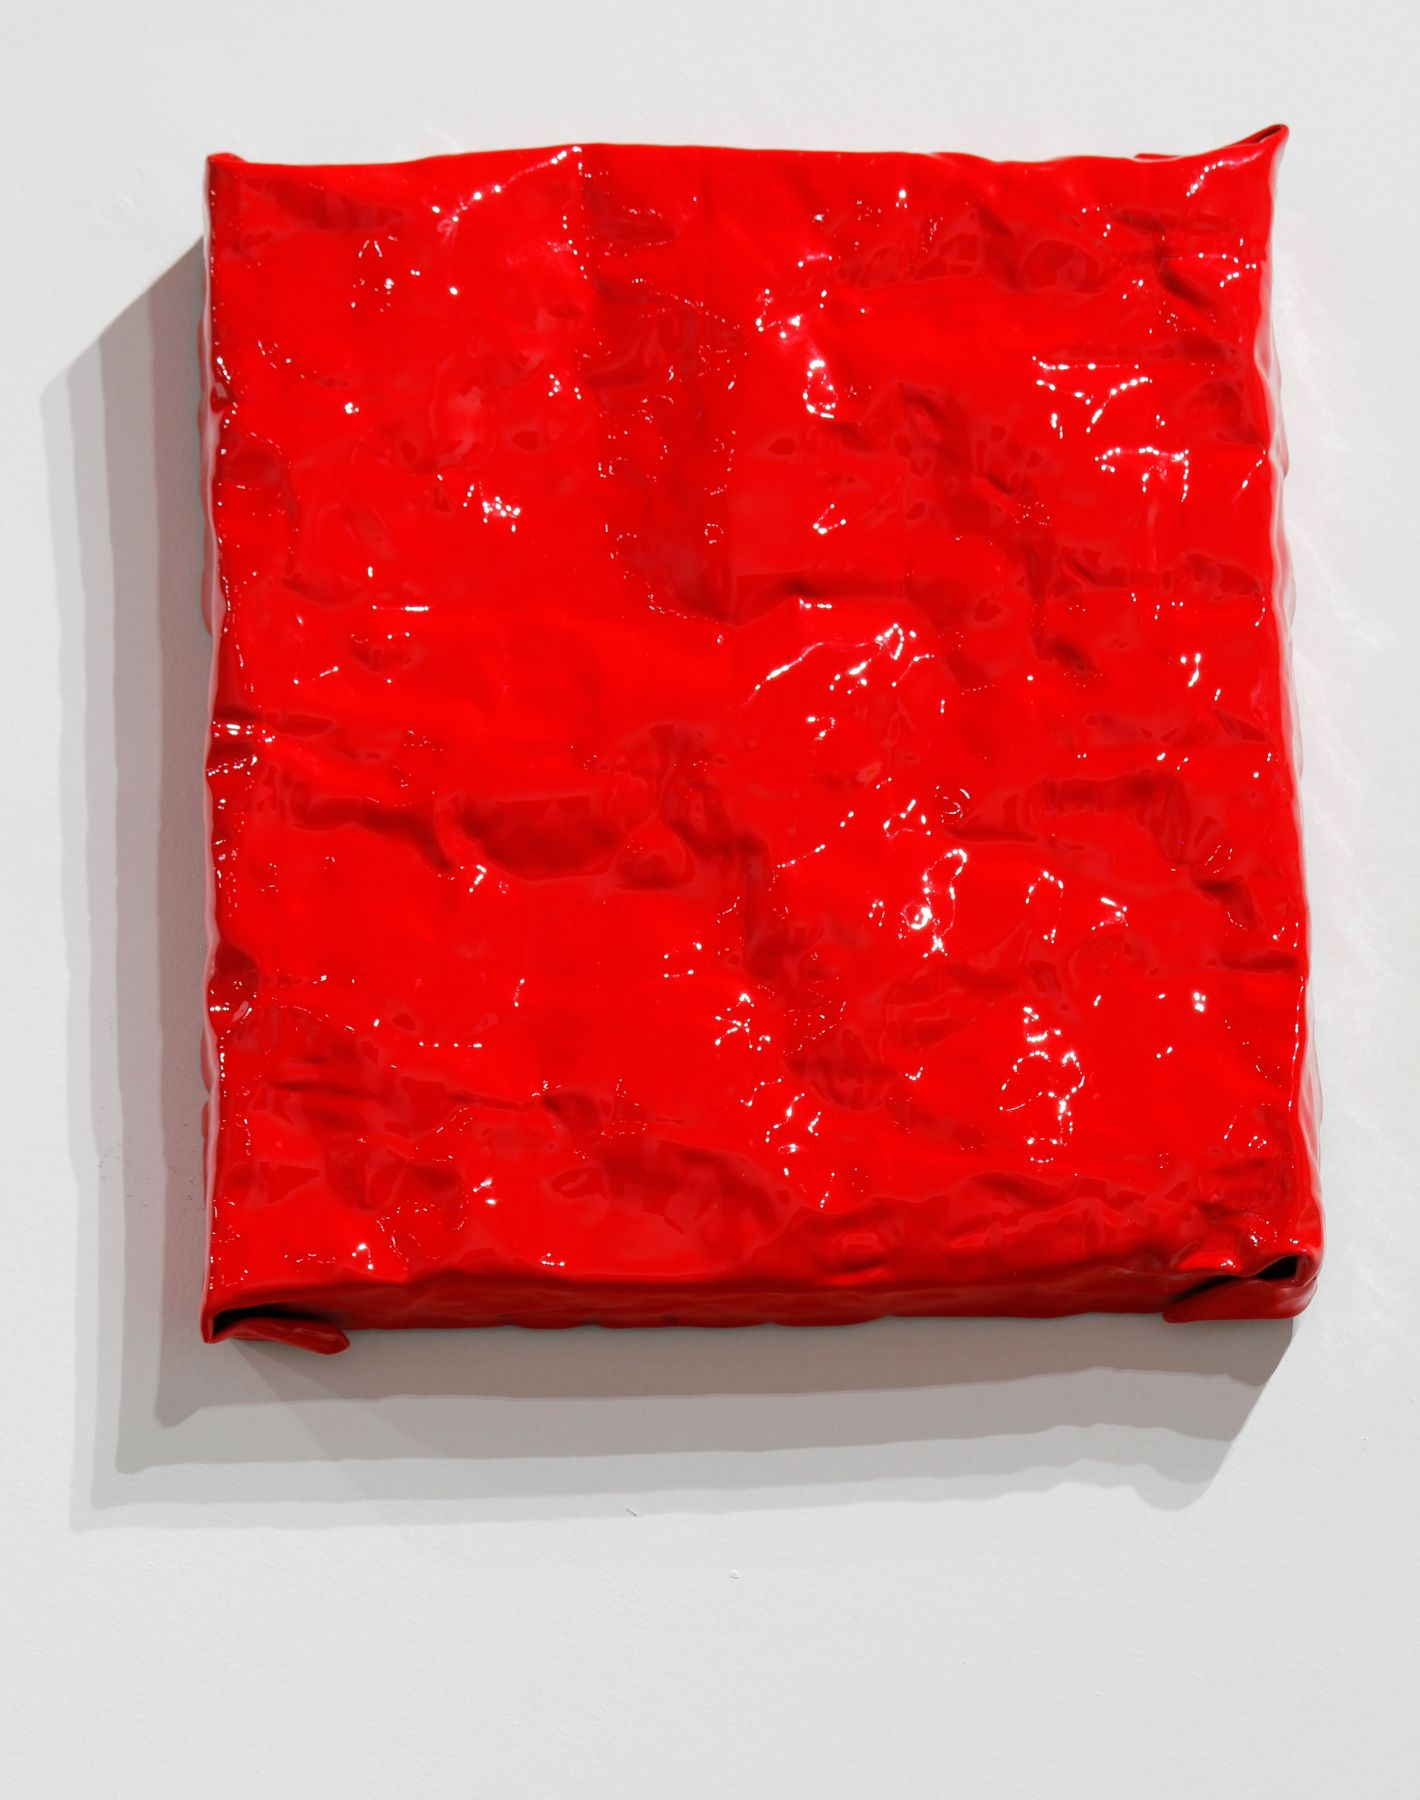 painting shiny wall sculpture minimalism